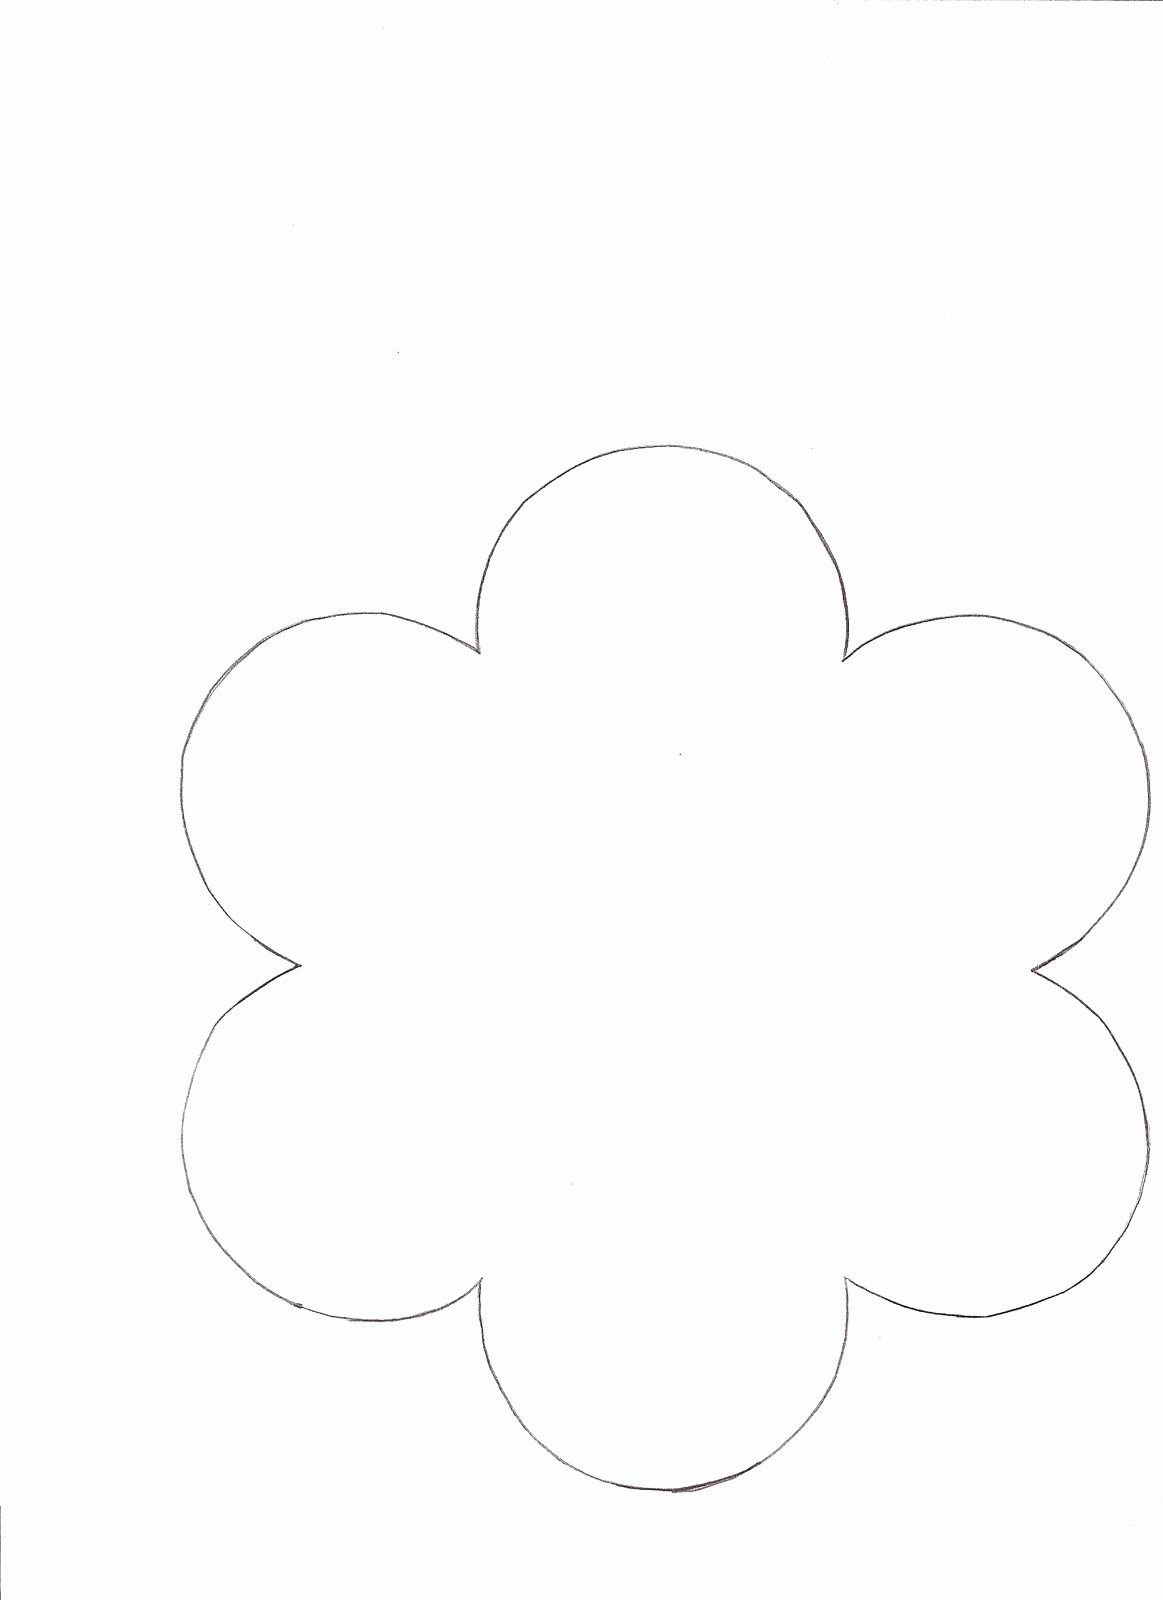 Five Petal Flower Template - Rehau.hauteboxx.co - 5 Petal Flower Template Free Printable